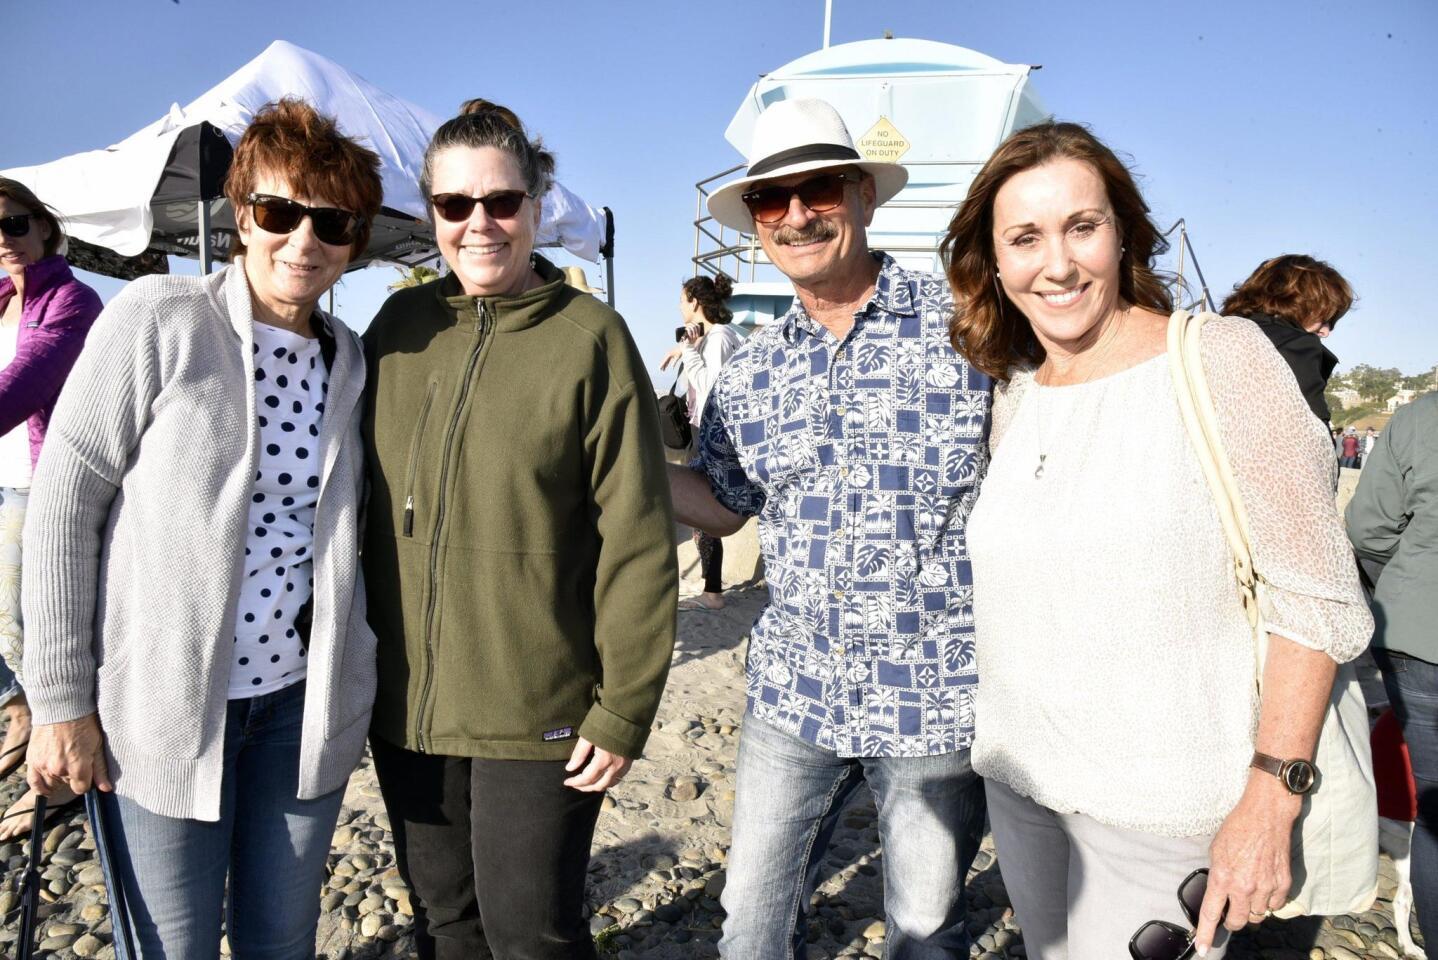 Beach Party unveils new name of San Elijo Lagoon Conservancy